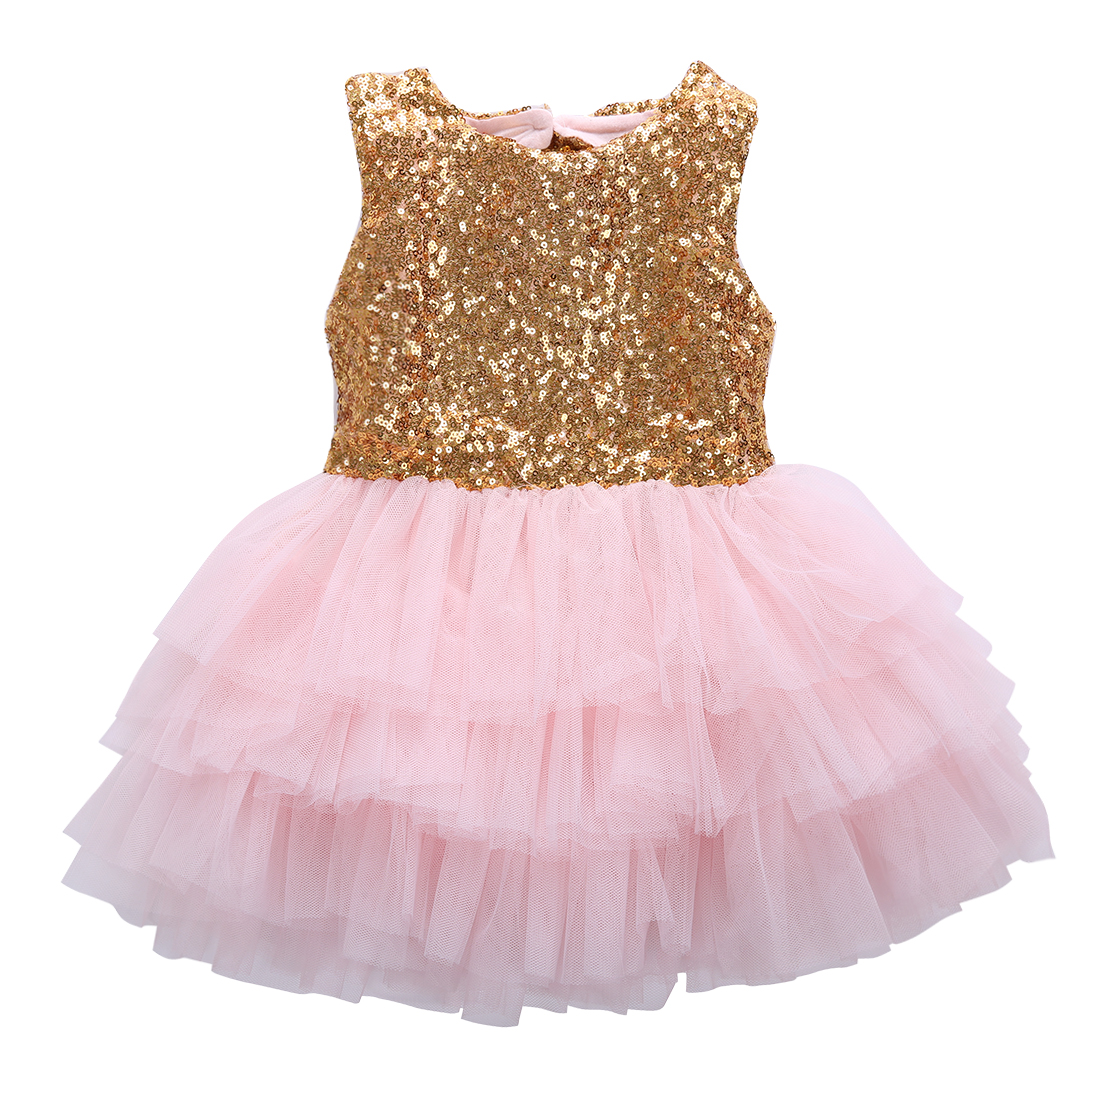 0c7daa32366a Online Shop Hi Hi Baby Store Pageant Flower Girl Sequins Cake Dress ...